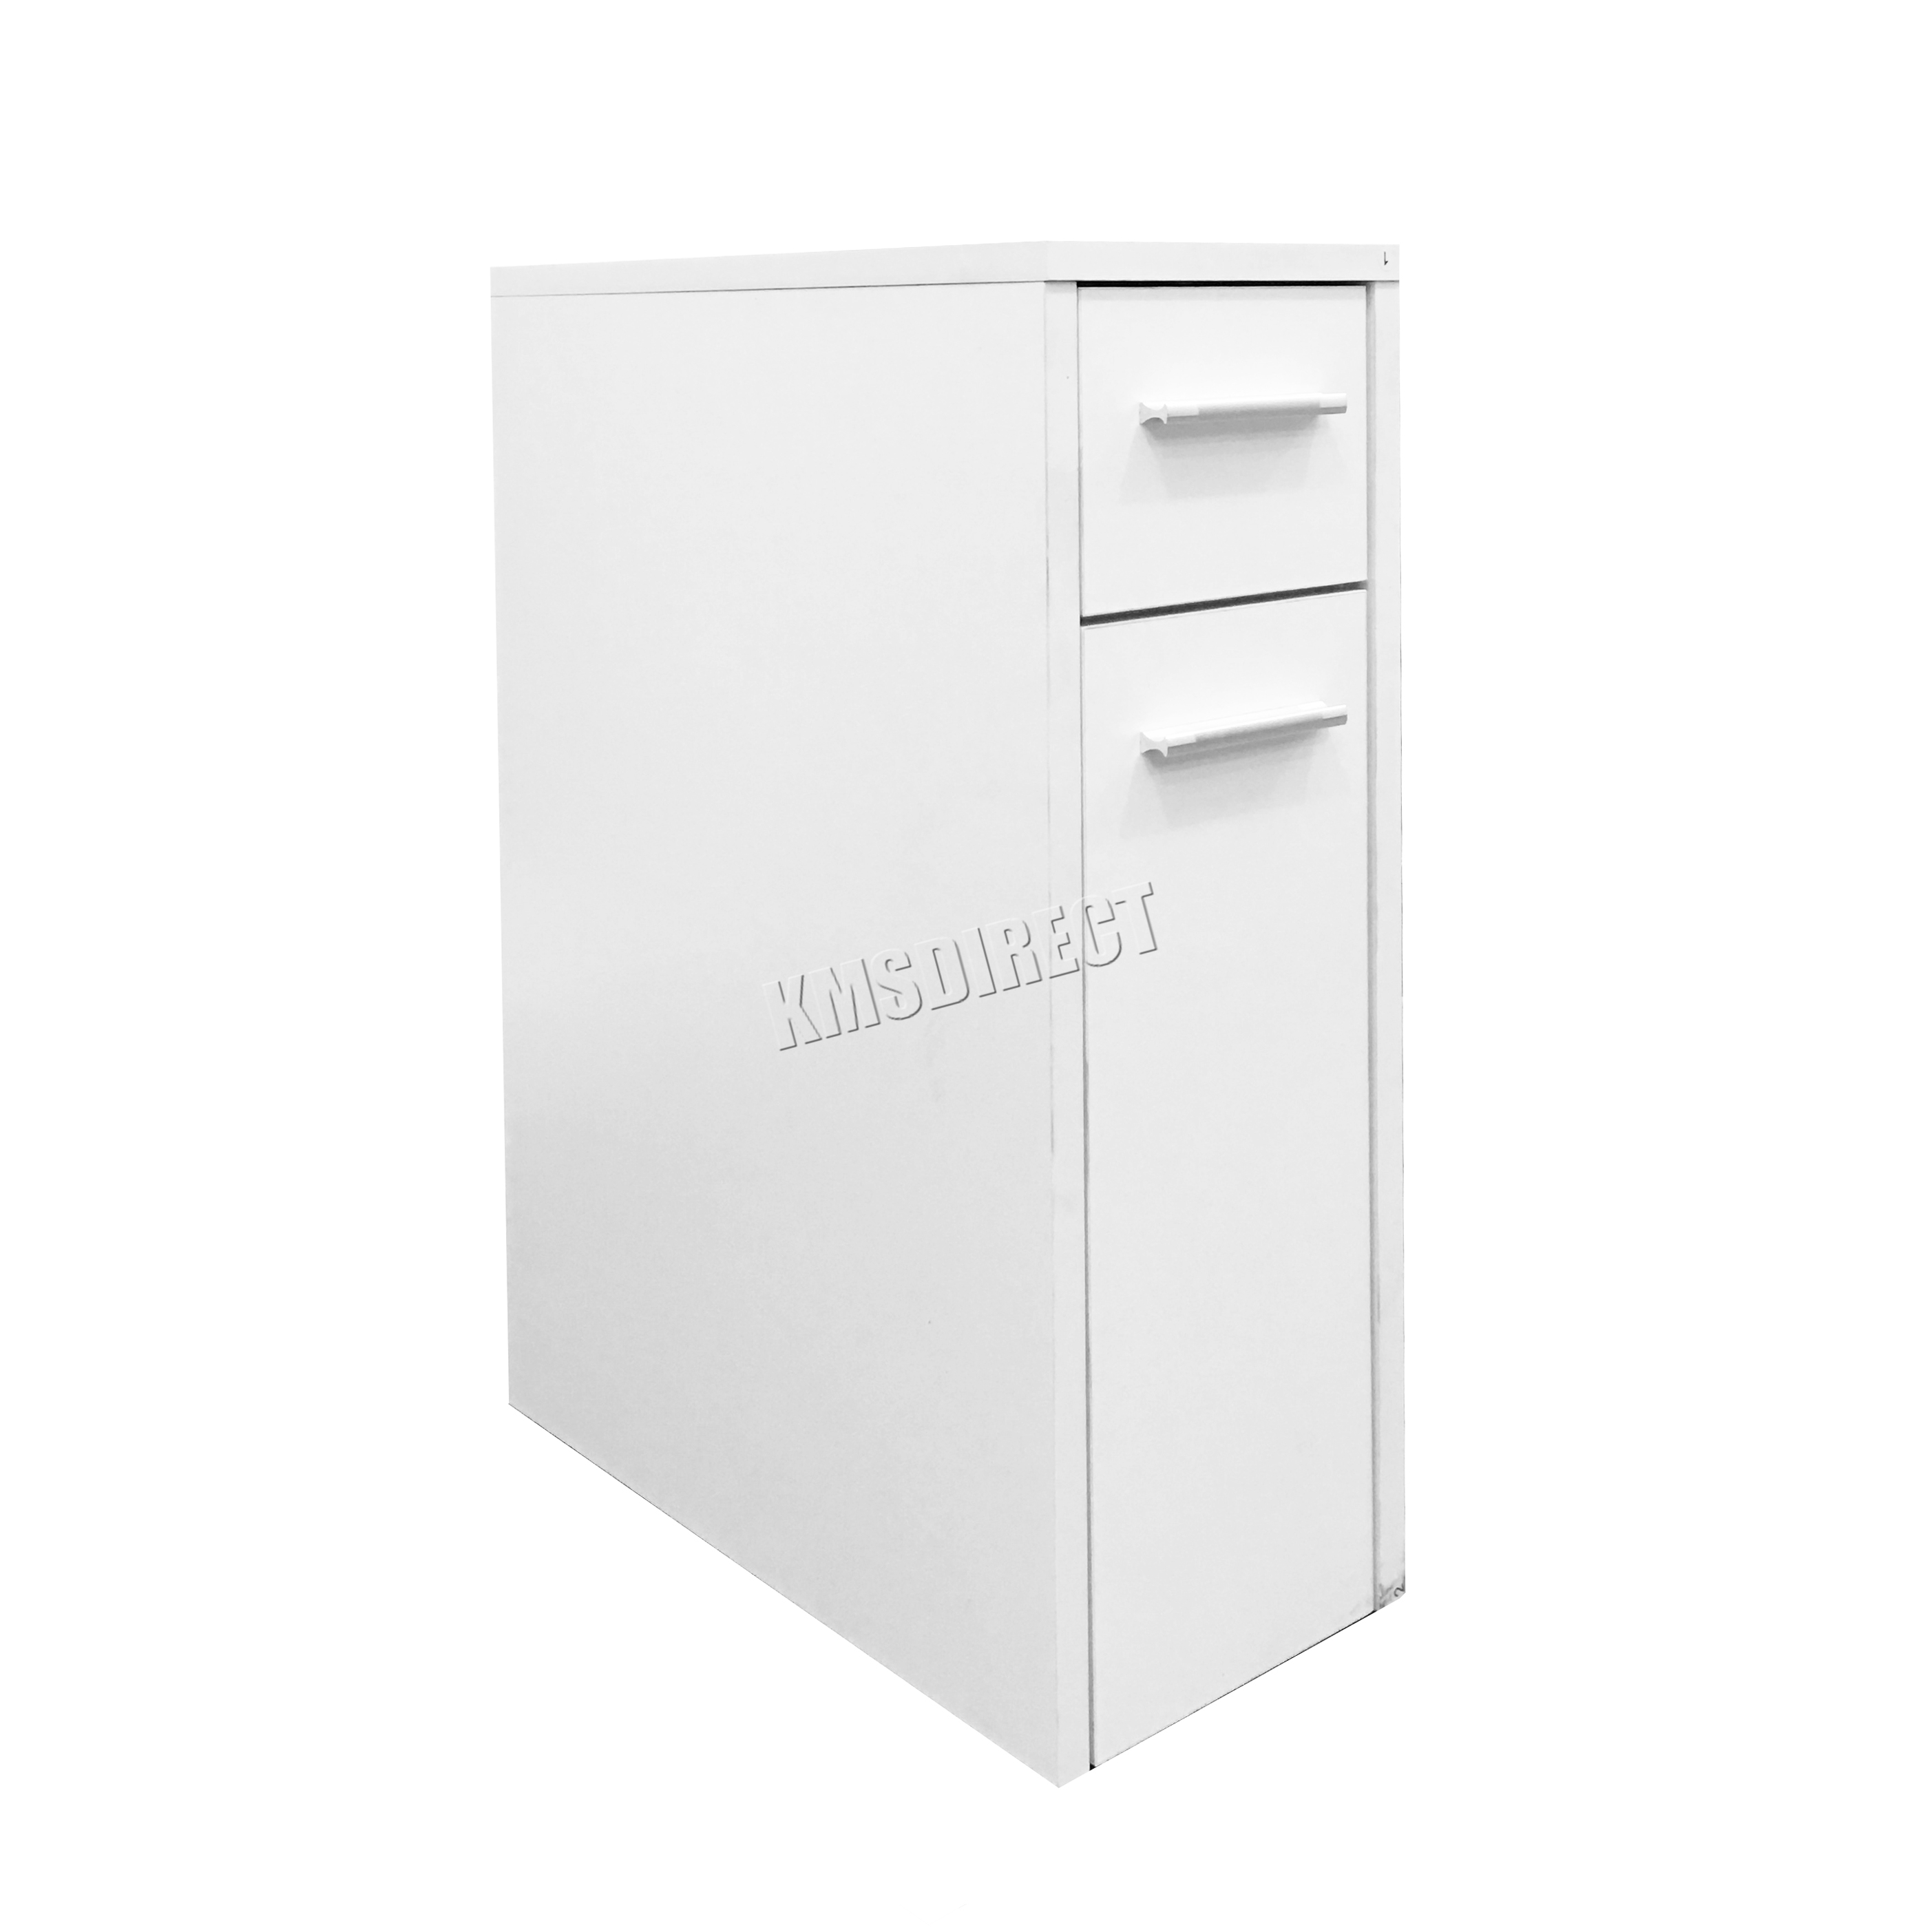 Thin Bathroom Cabinet Foxhunter Slimline Bathroom Slide Out Storage Drawer Cabinet